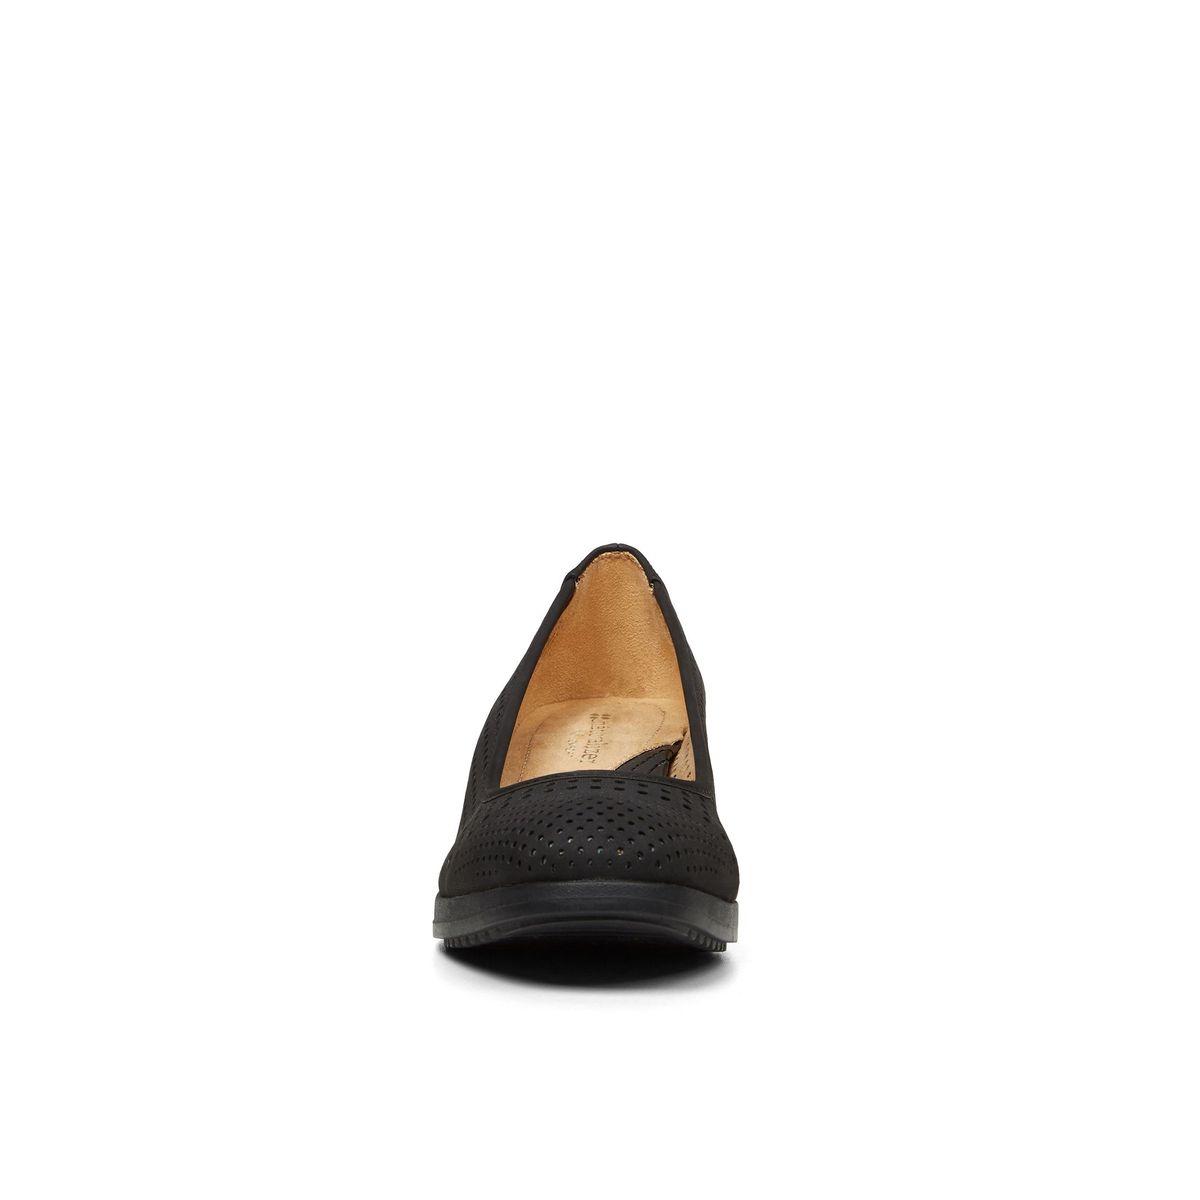 Talons C Chaussures Naturalizer Femmes À 80Nwmn